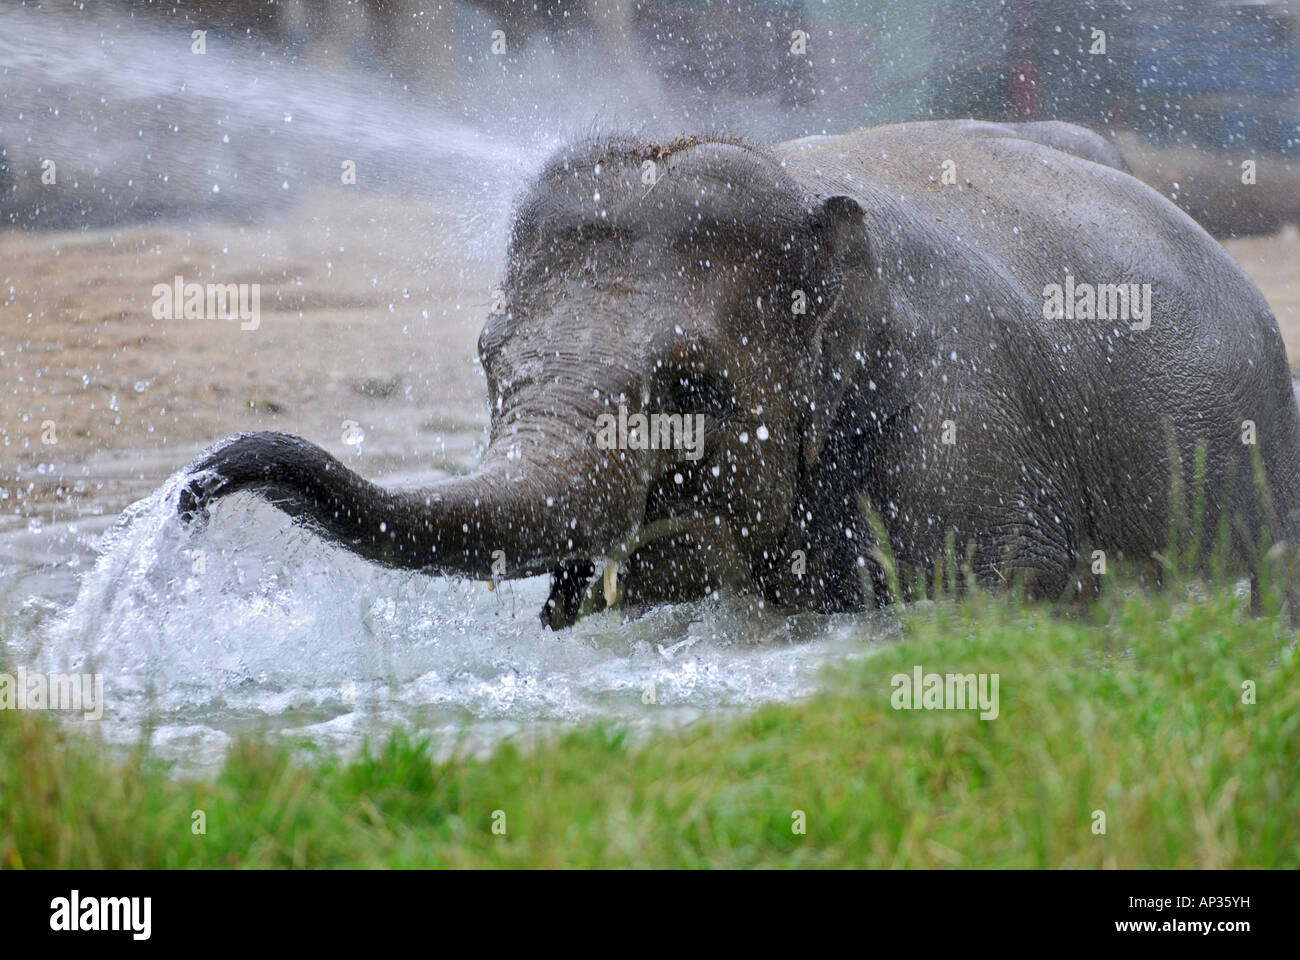 Elephant bathing in water in Munich Zoo, Tierpark Hellabrunn, Bavaria, Germany - Stock Image